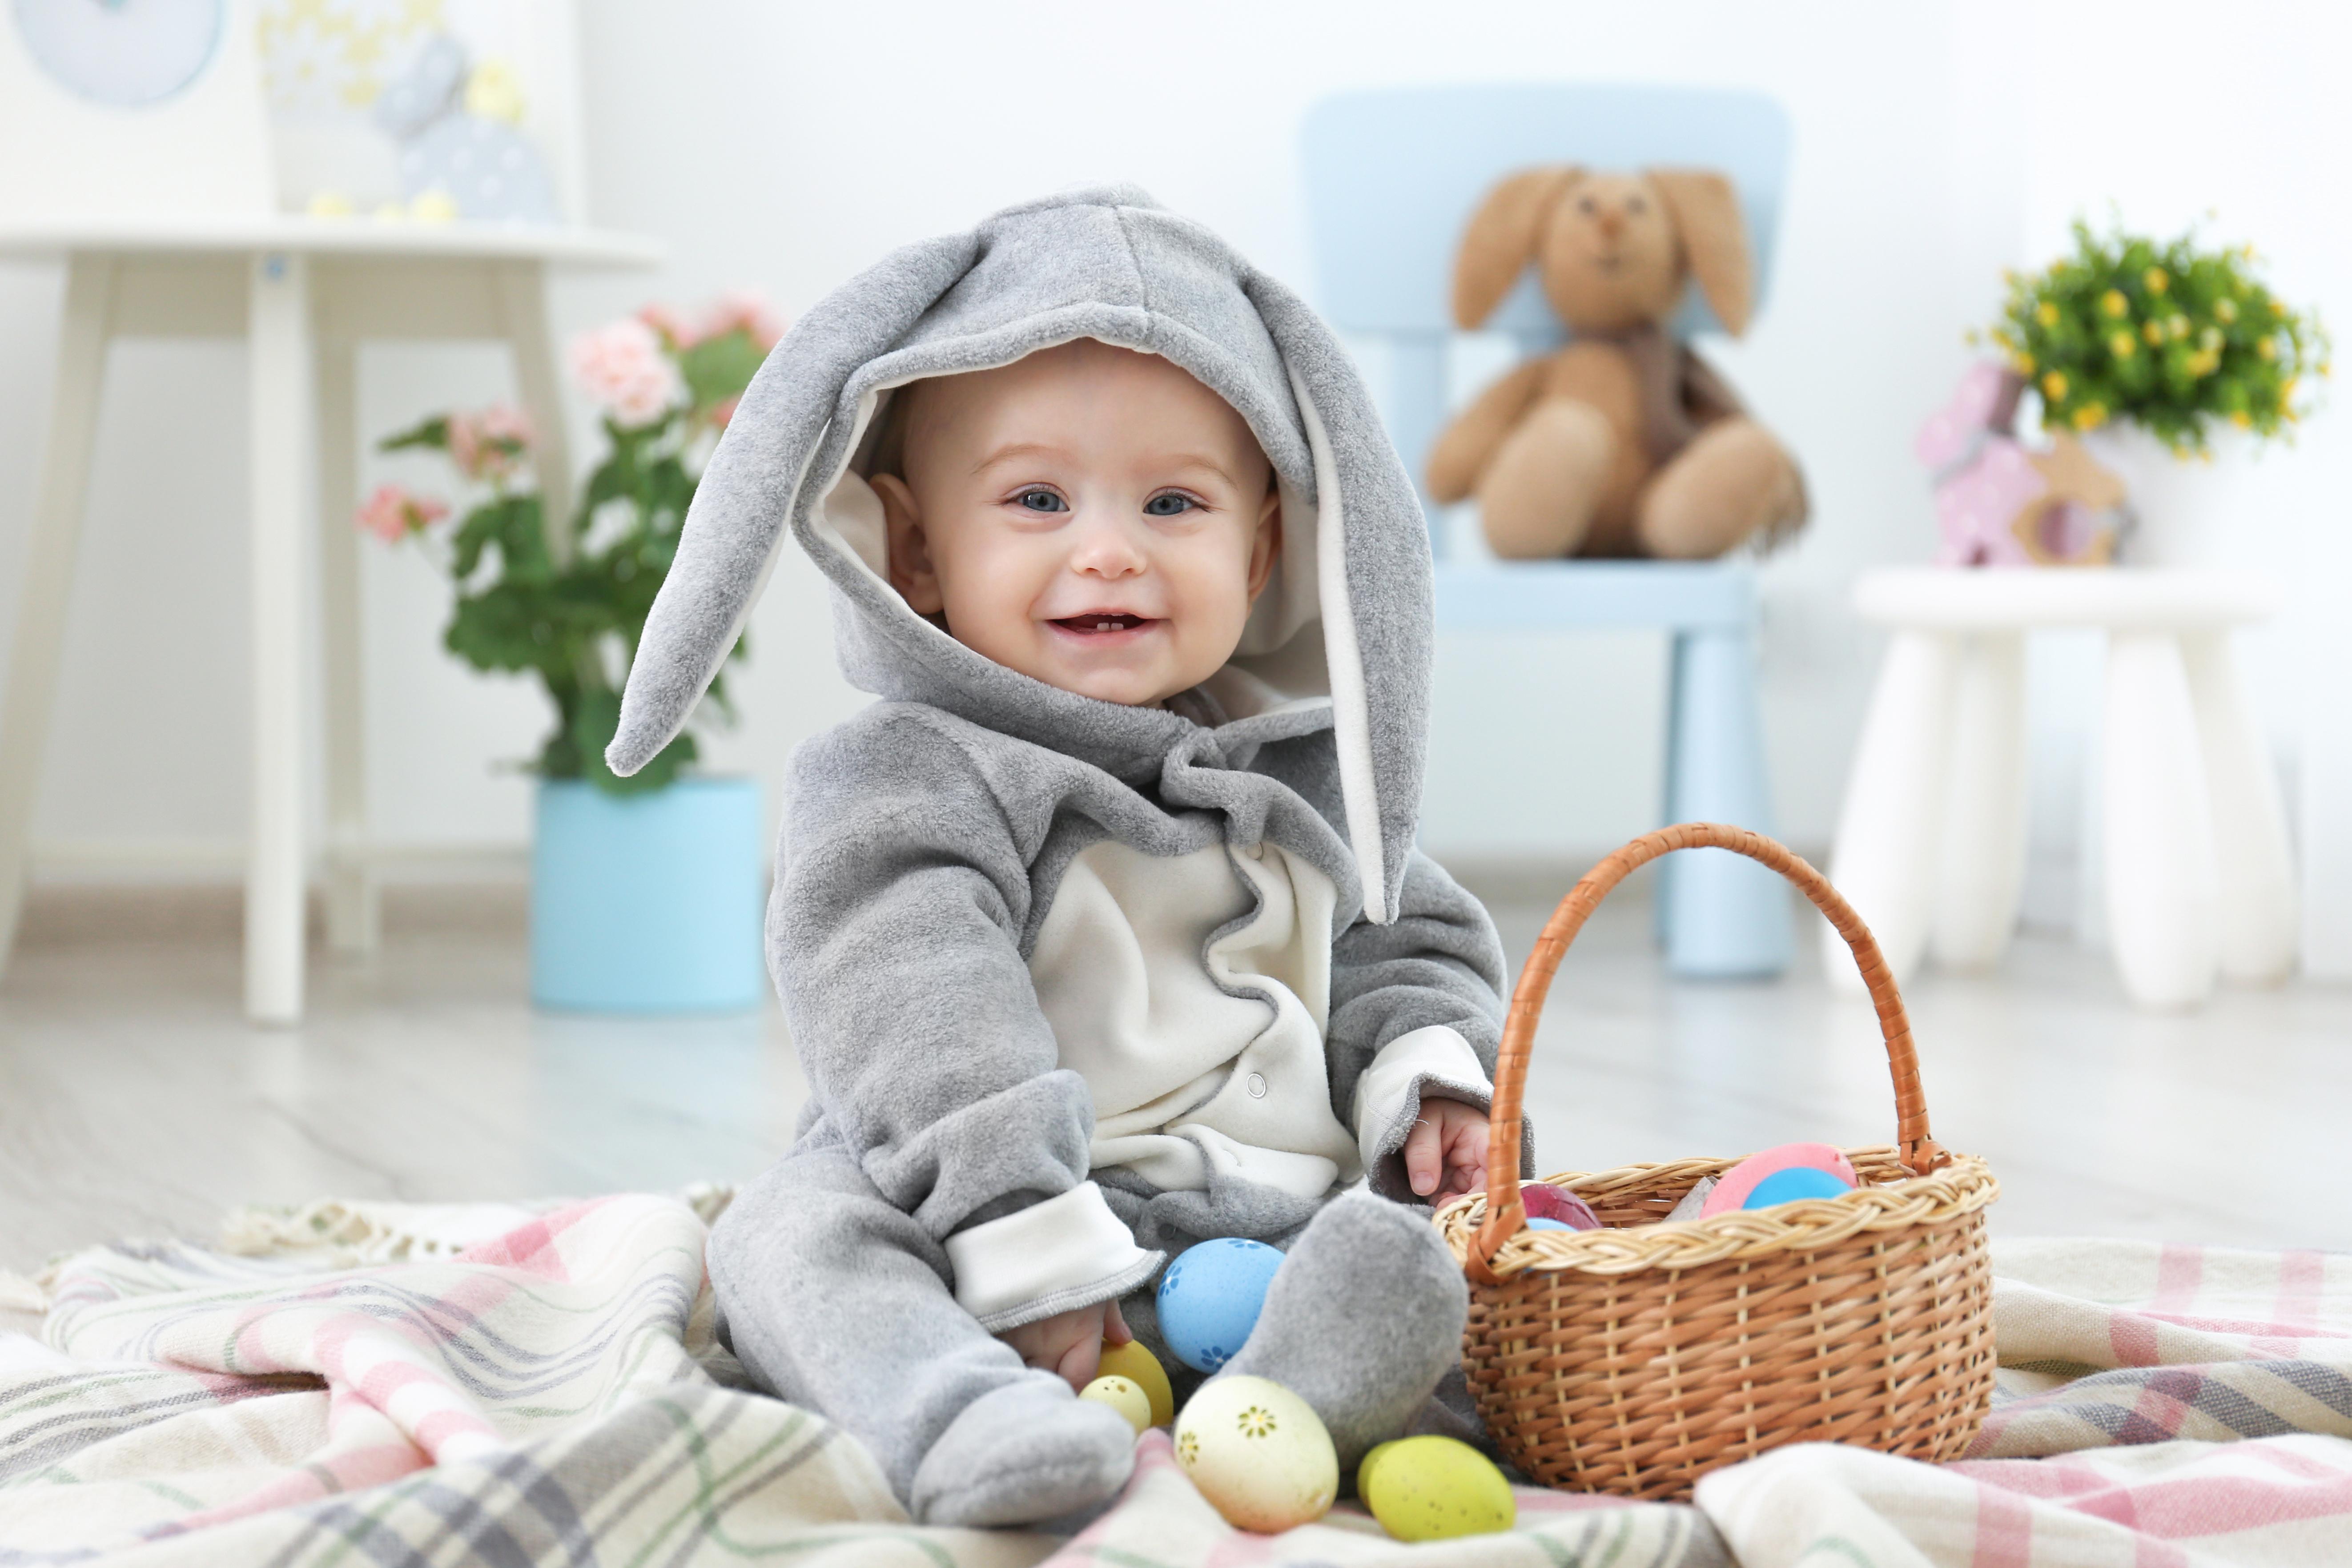 Картинки Пасха Кролики Младенцы Яйца ребёнок Корзинка Униформа Праздники кролик младенец младенца грудной ребёнок яиц яйцо Дети яйцами Корзина корзины униформе